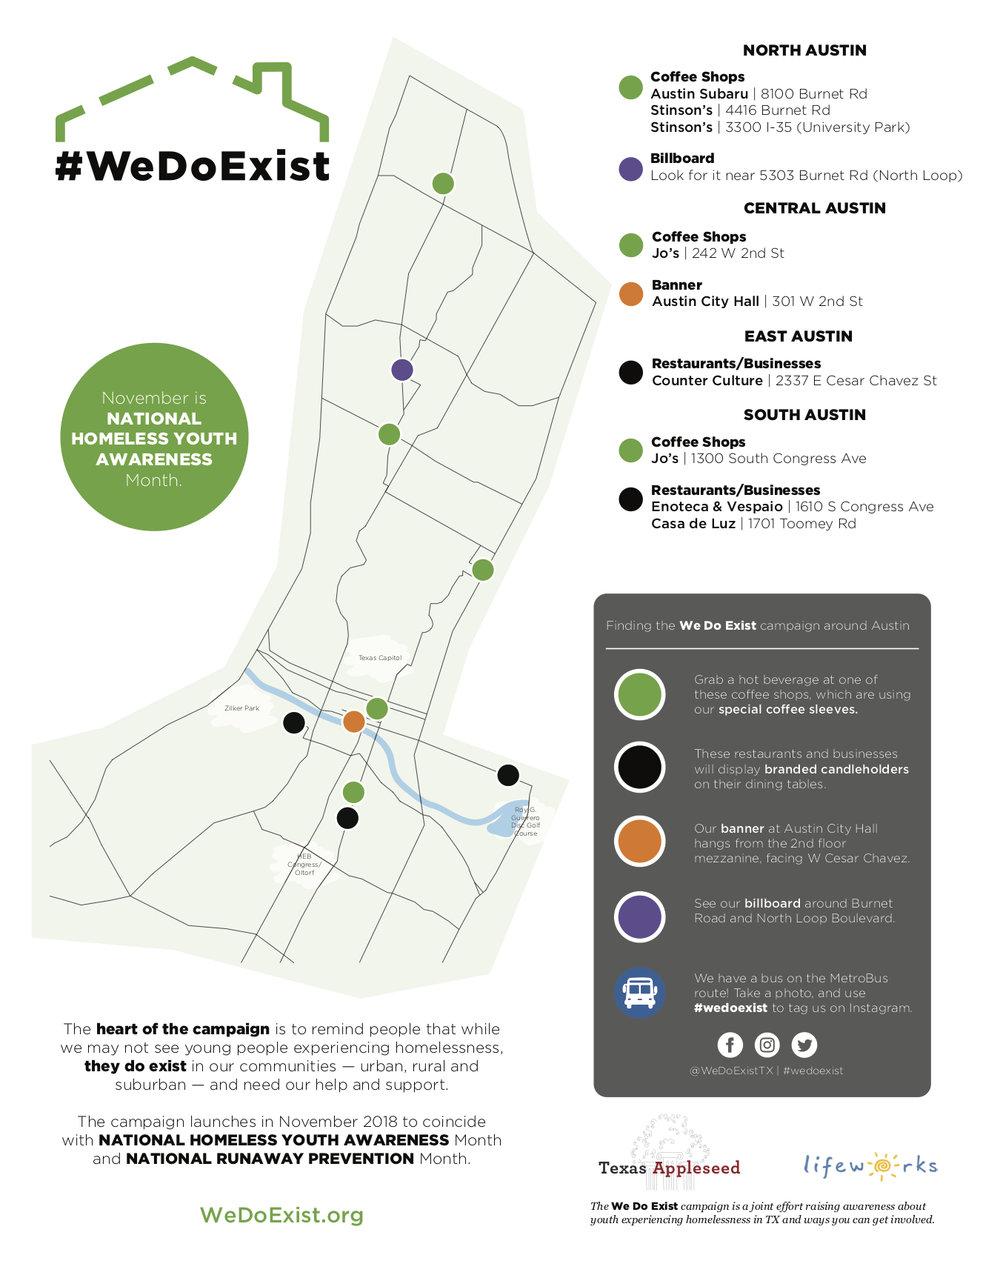 wedoexist-map-updated-110918 (1).jpg